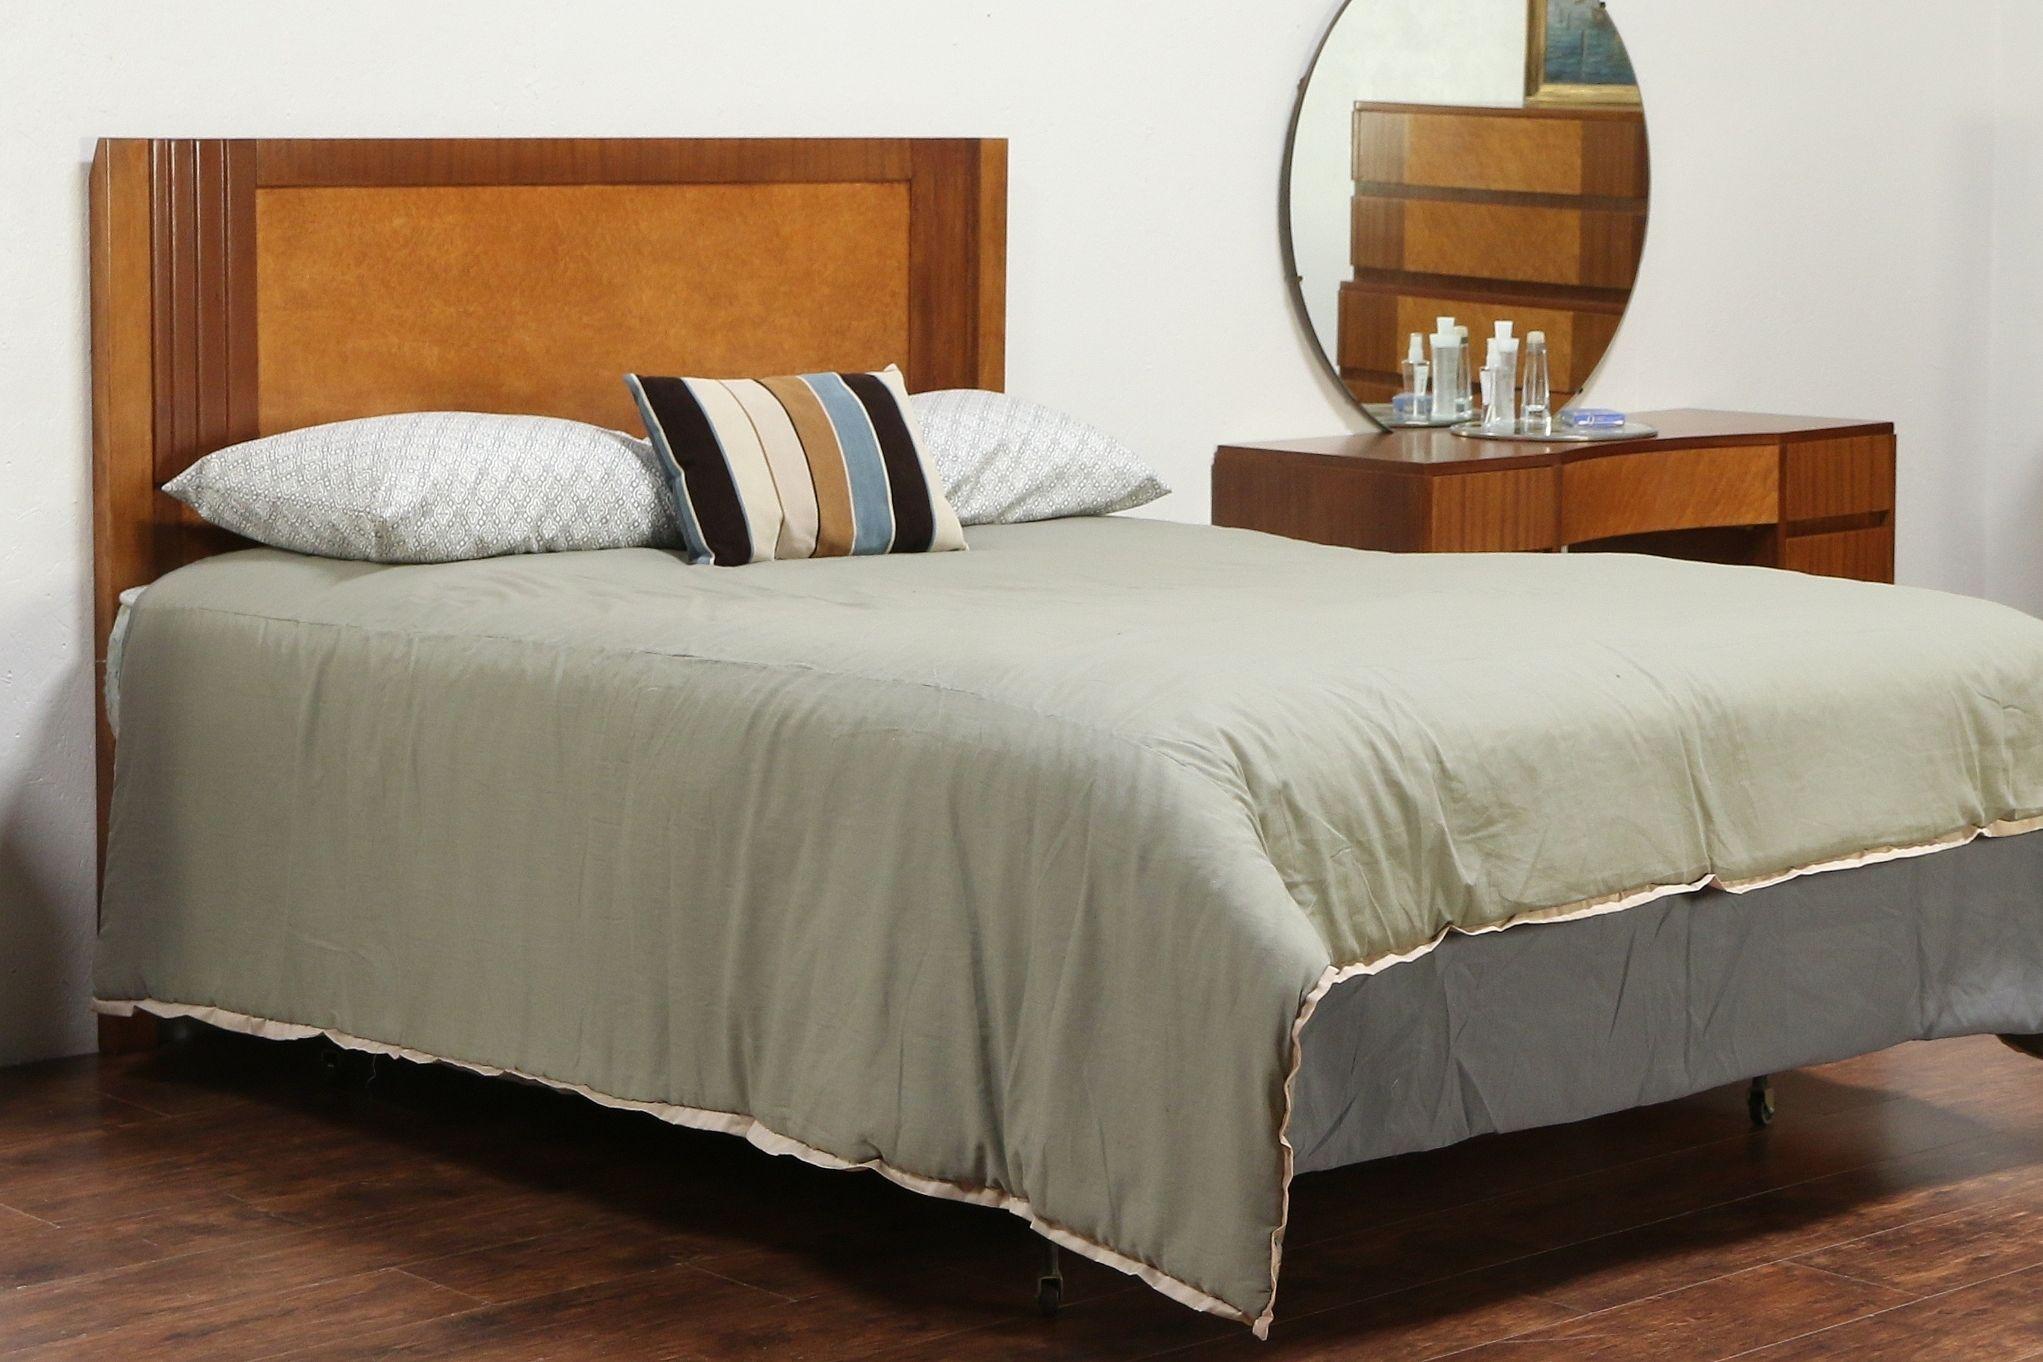 Midcentury modern queen size bed headboard vintage maple mahogany rway 29525